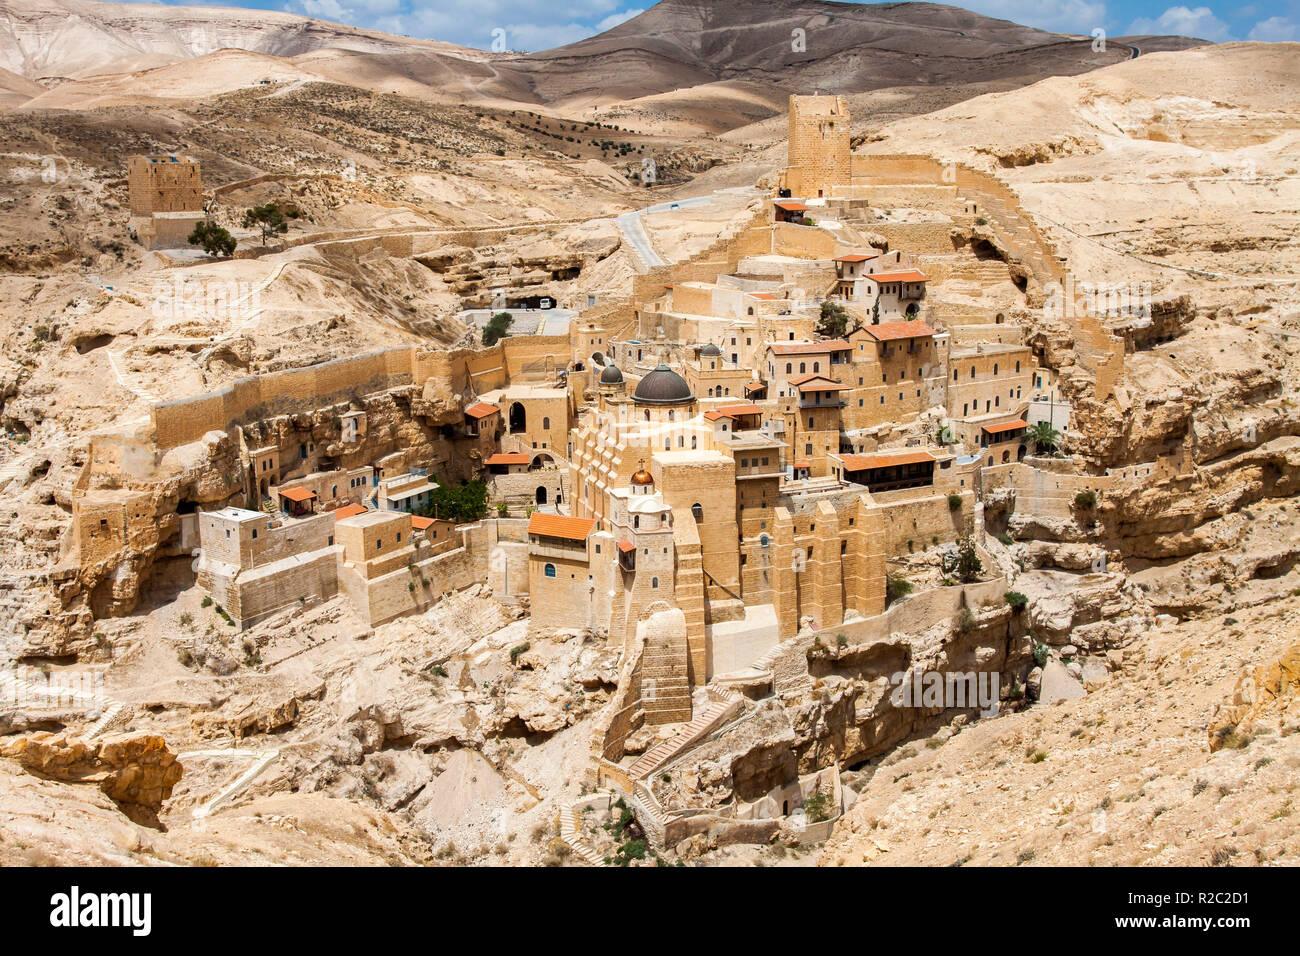 Holy Lavra of Saint Sabbas, Mar Saba, Eastern Orthodox Christian monastery overlooking the Kidron Valley. West Bank, Palestine, Israel. - Stock Image